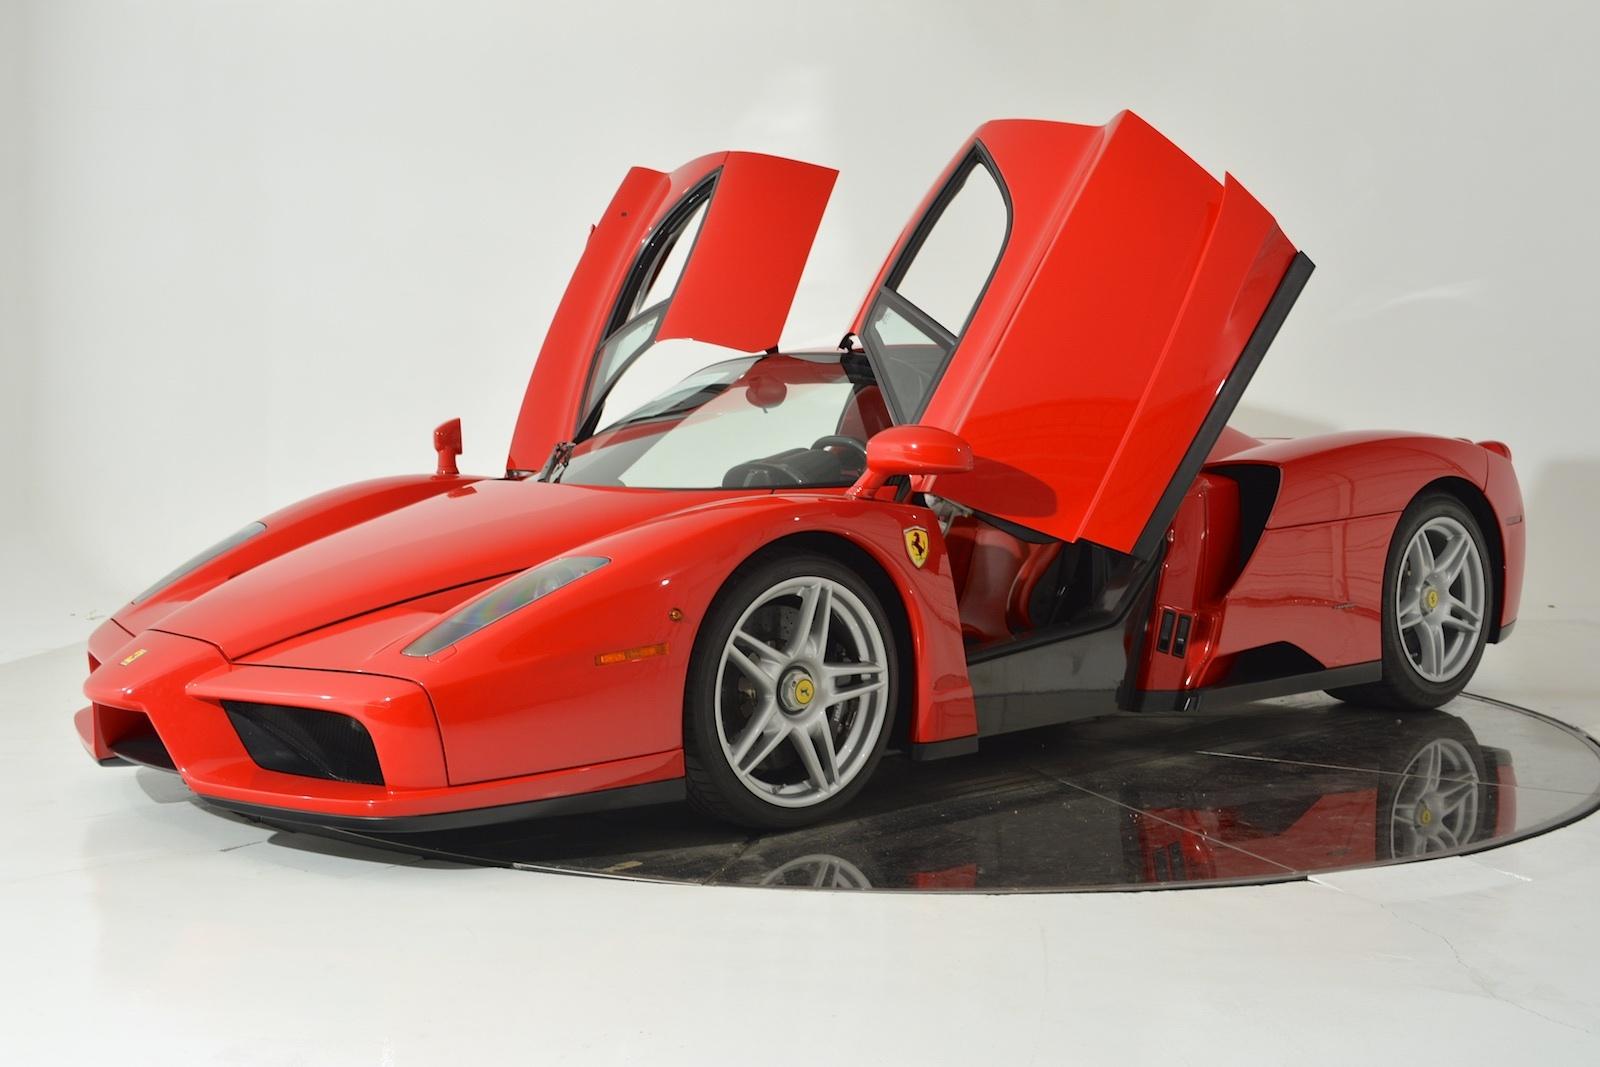 2003 Ferrari Enzo Sales Price